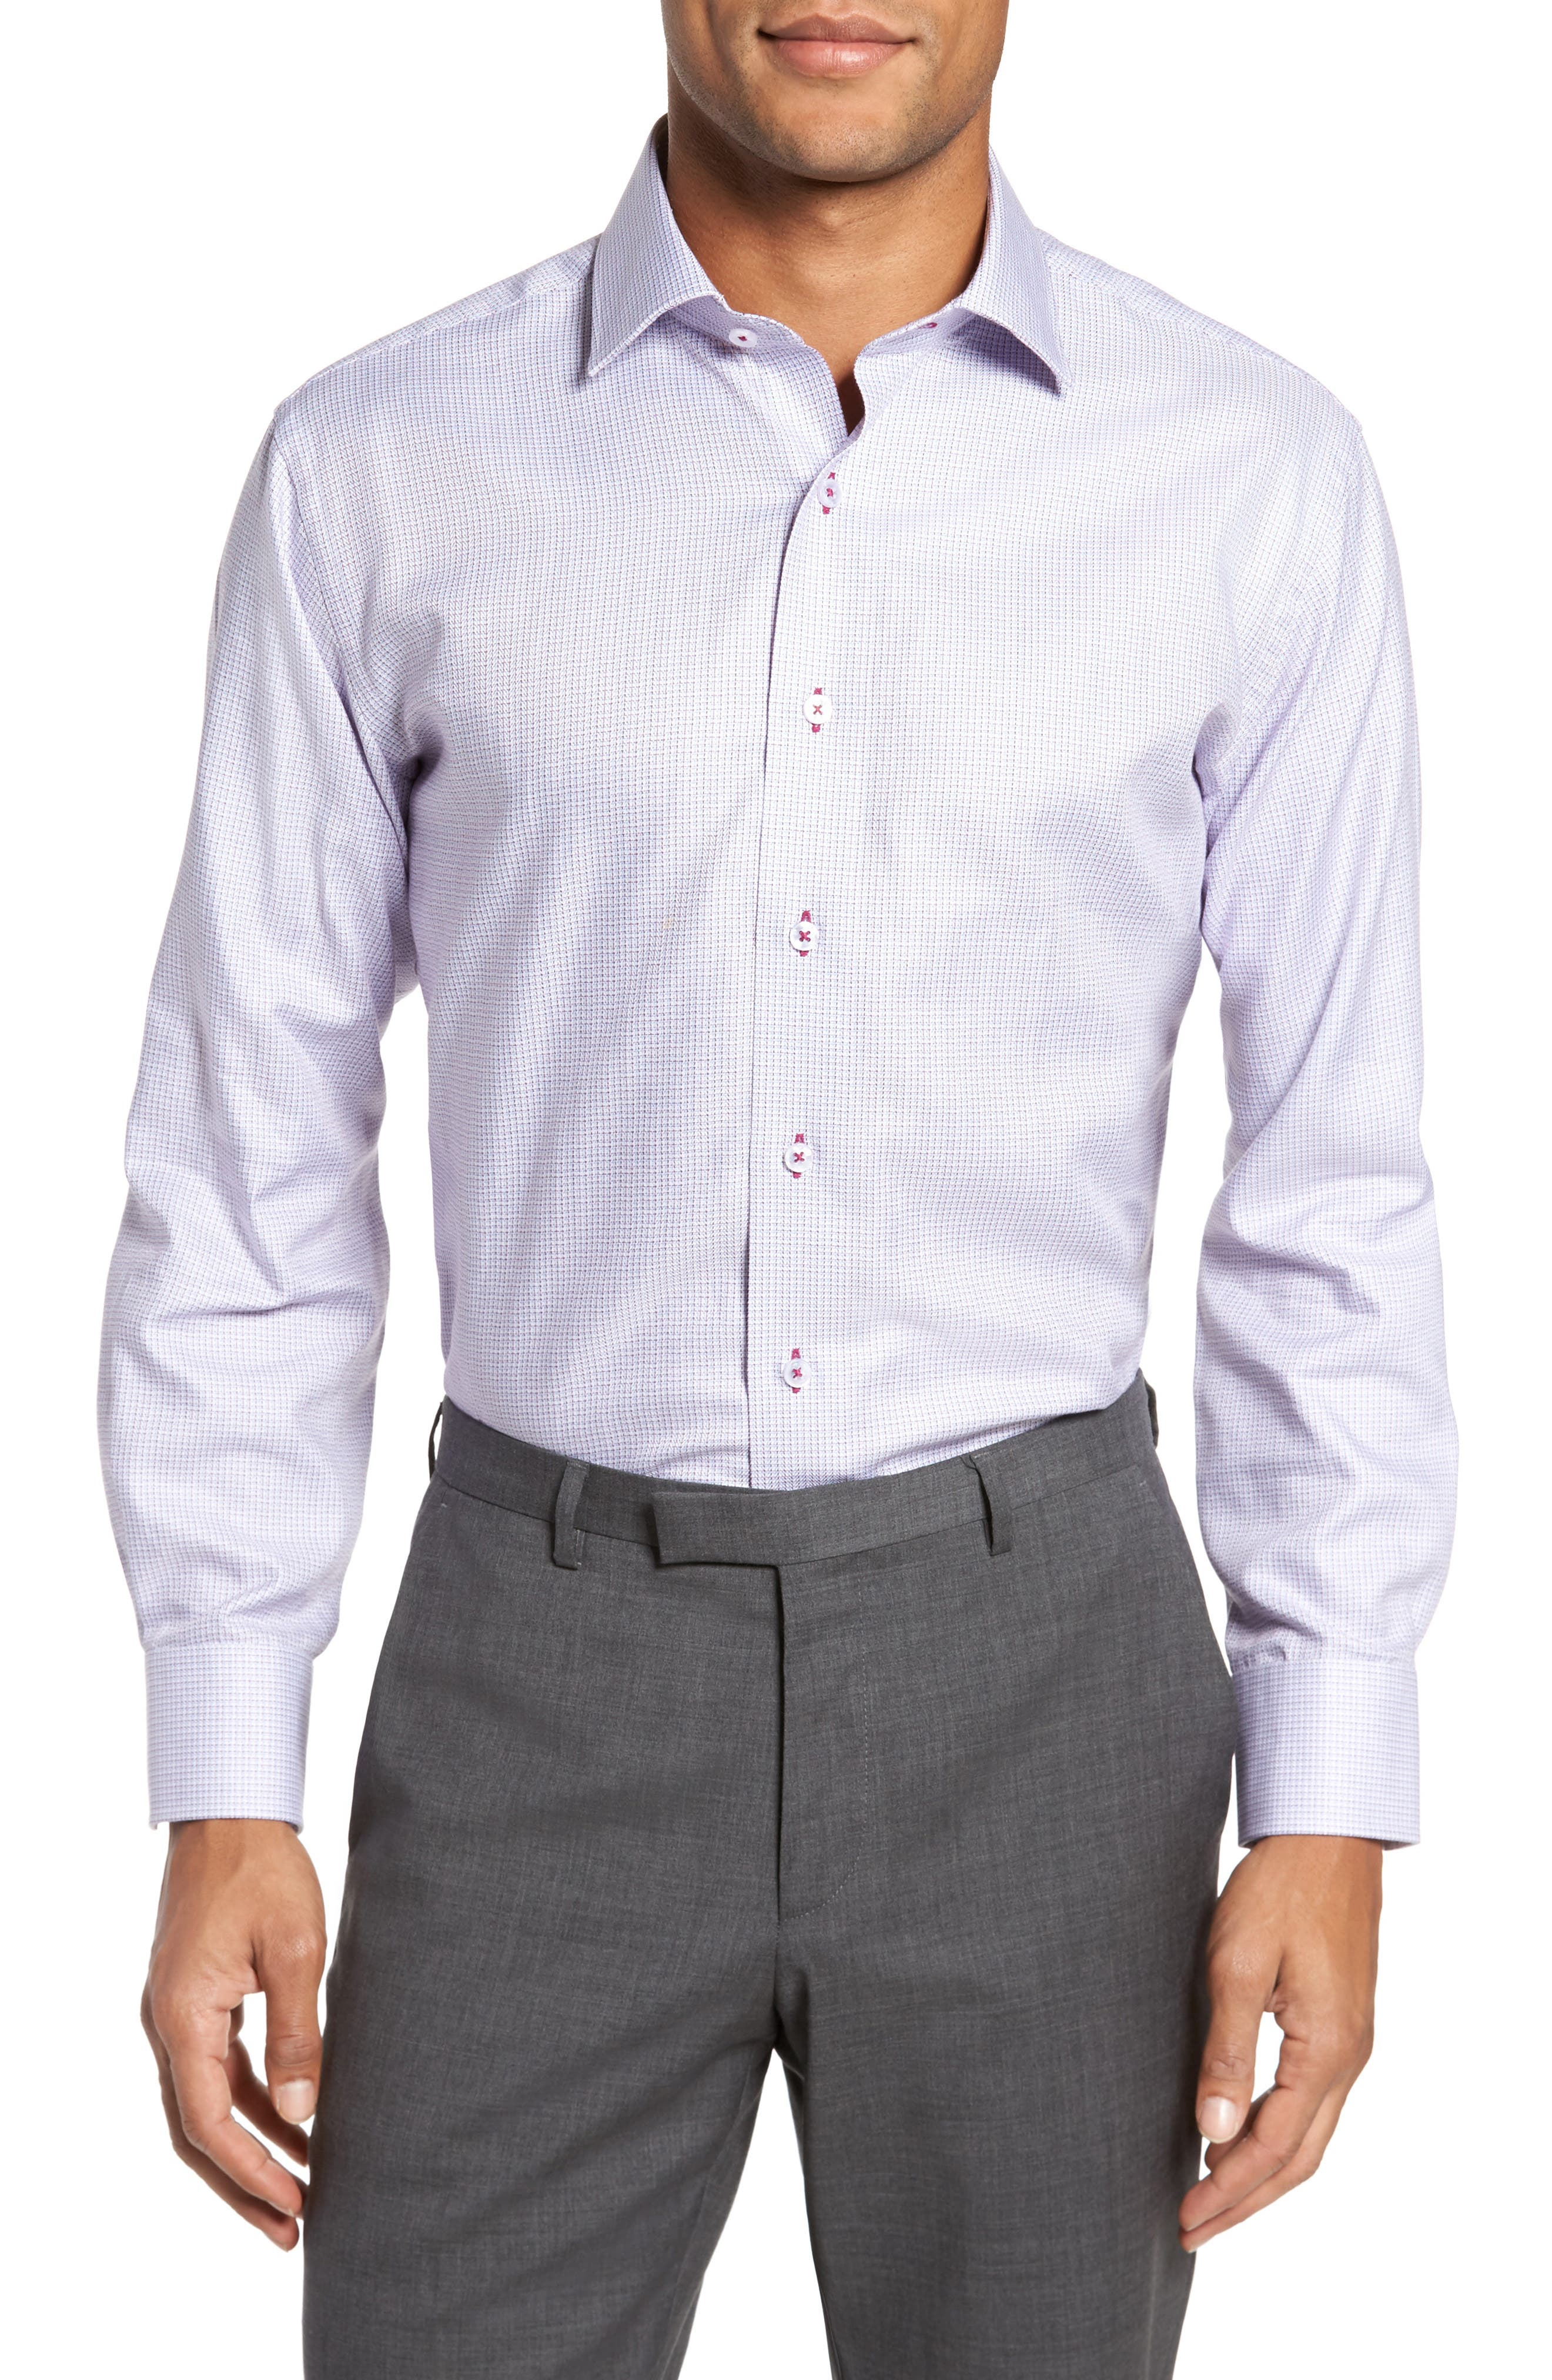 Trim Fit Textured Check Dress Shirt,                             Main thumbnail 1, color,                             LIGHT BLUE